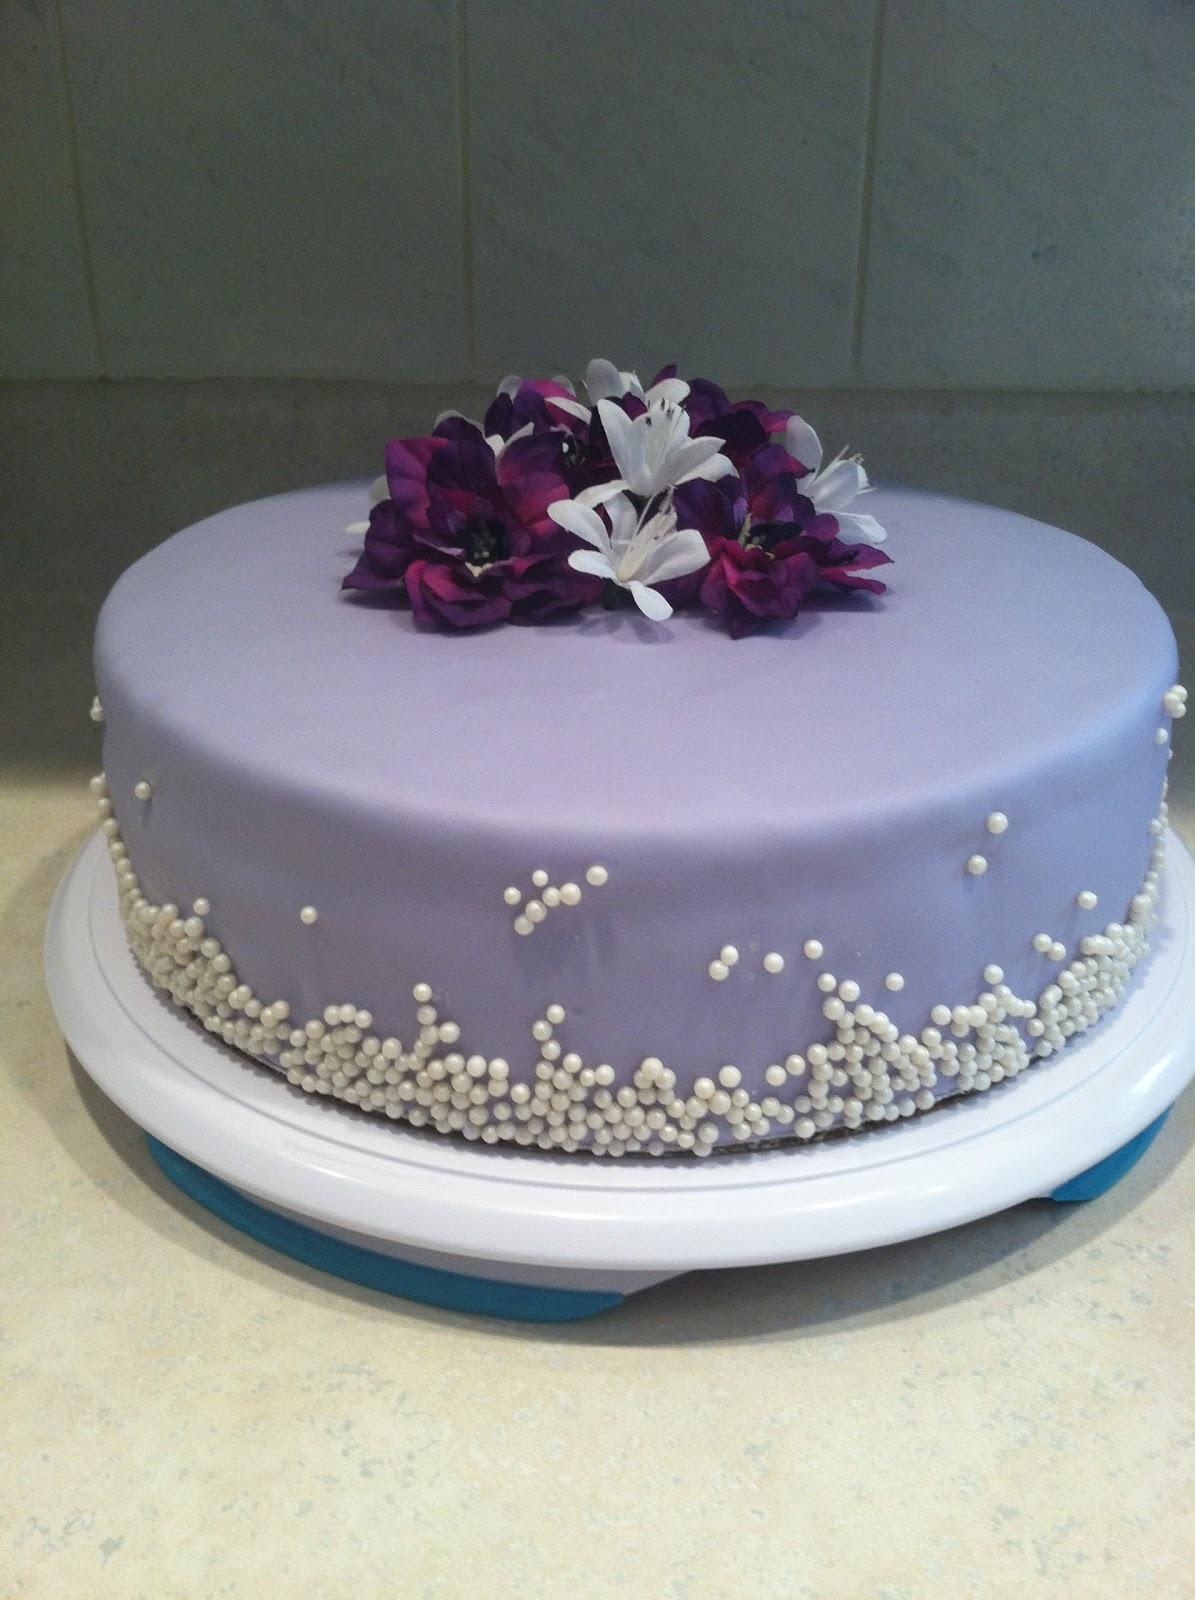 Cake Designs With Purple : Marshmallow Masterpieces!: Purple Birthday Cake